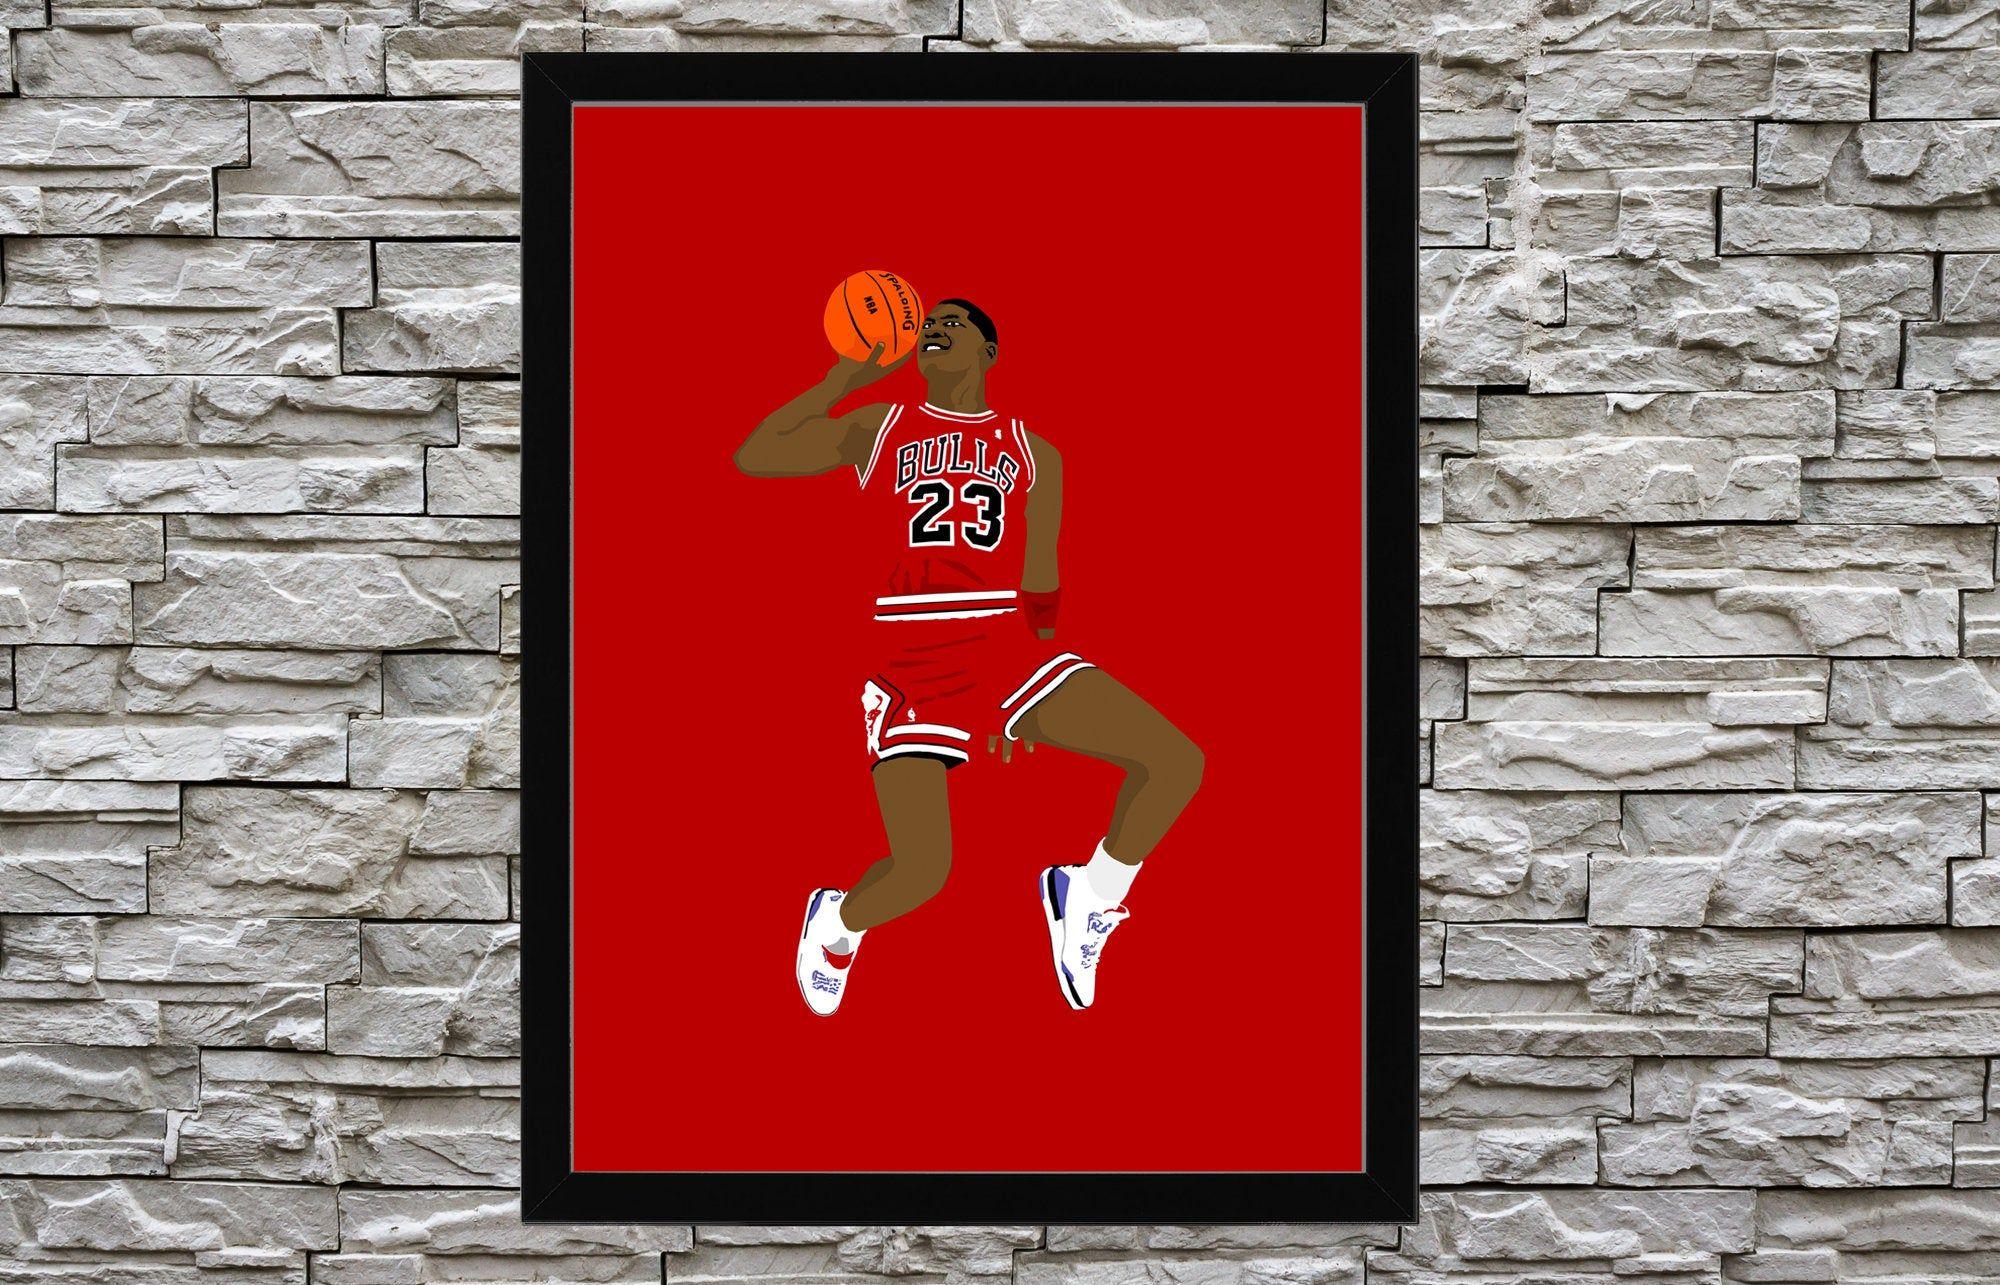 Michael Jordan Painting Artwork Canvas For Wall Art Decor Etsy Jordan Painting Artwork Painting Painting